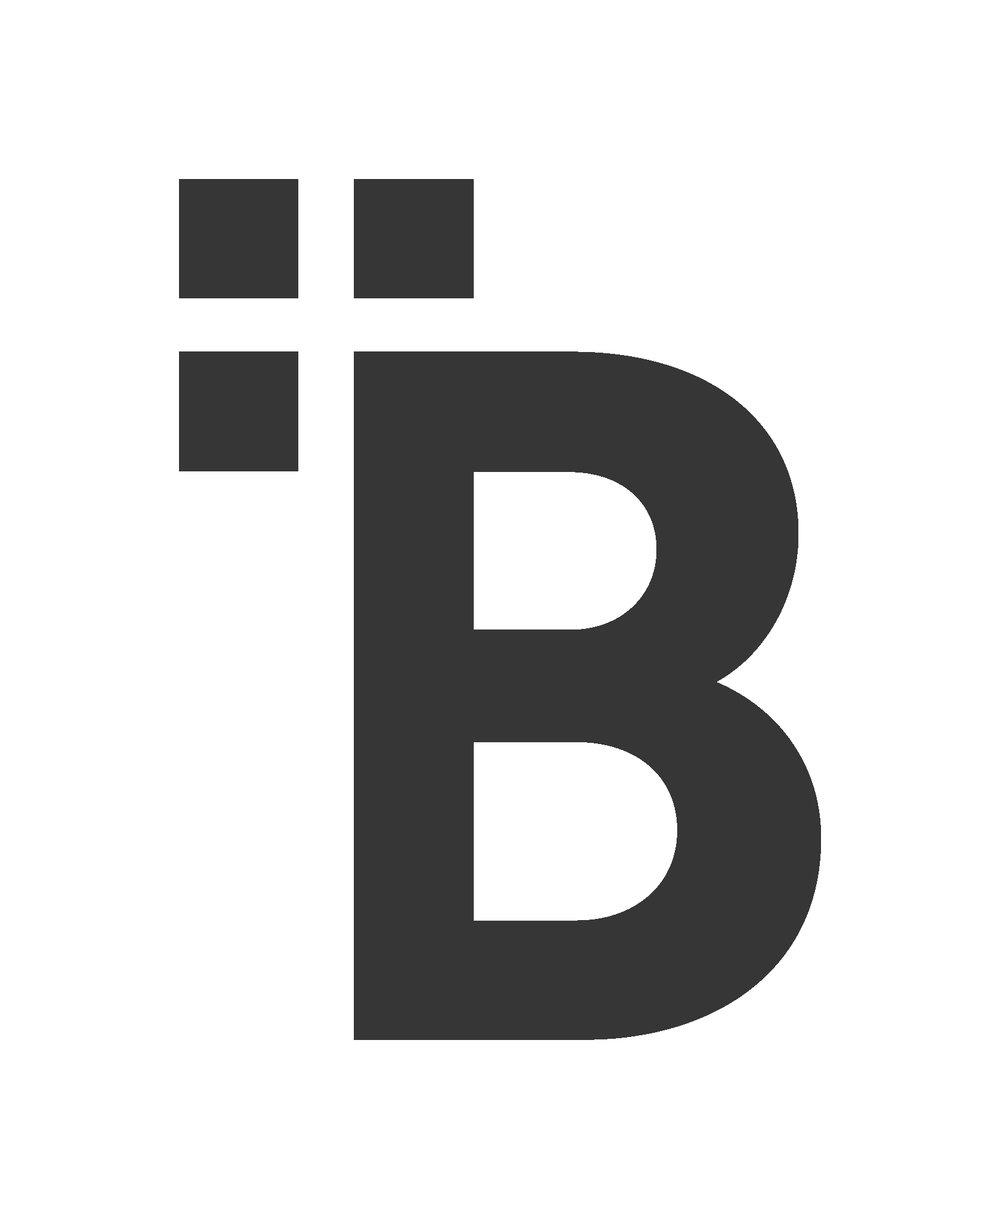 BedrockAffect-Icon-Gray.jpg